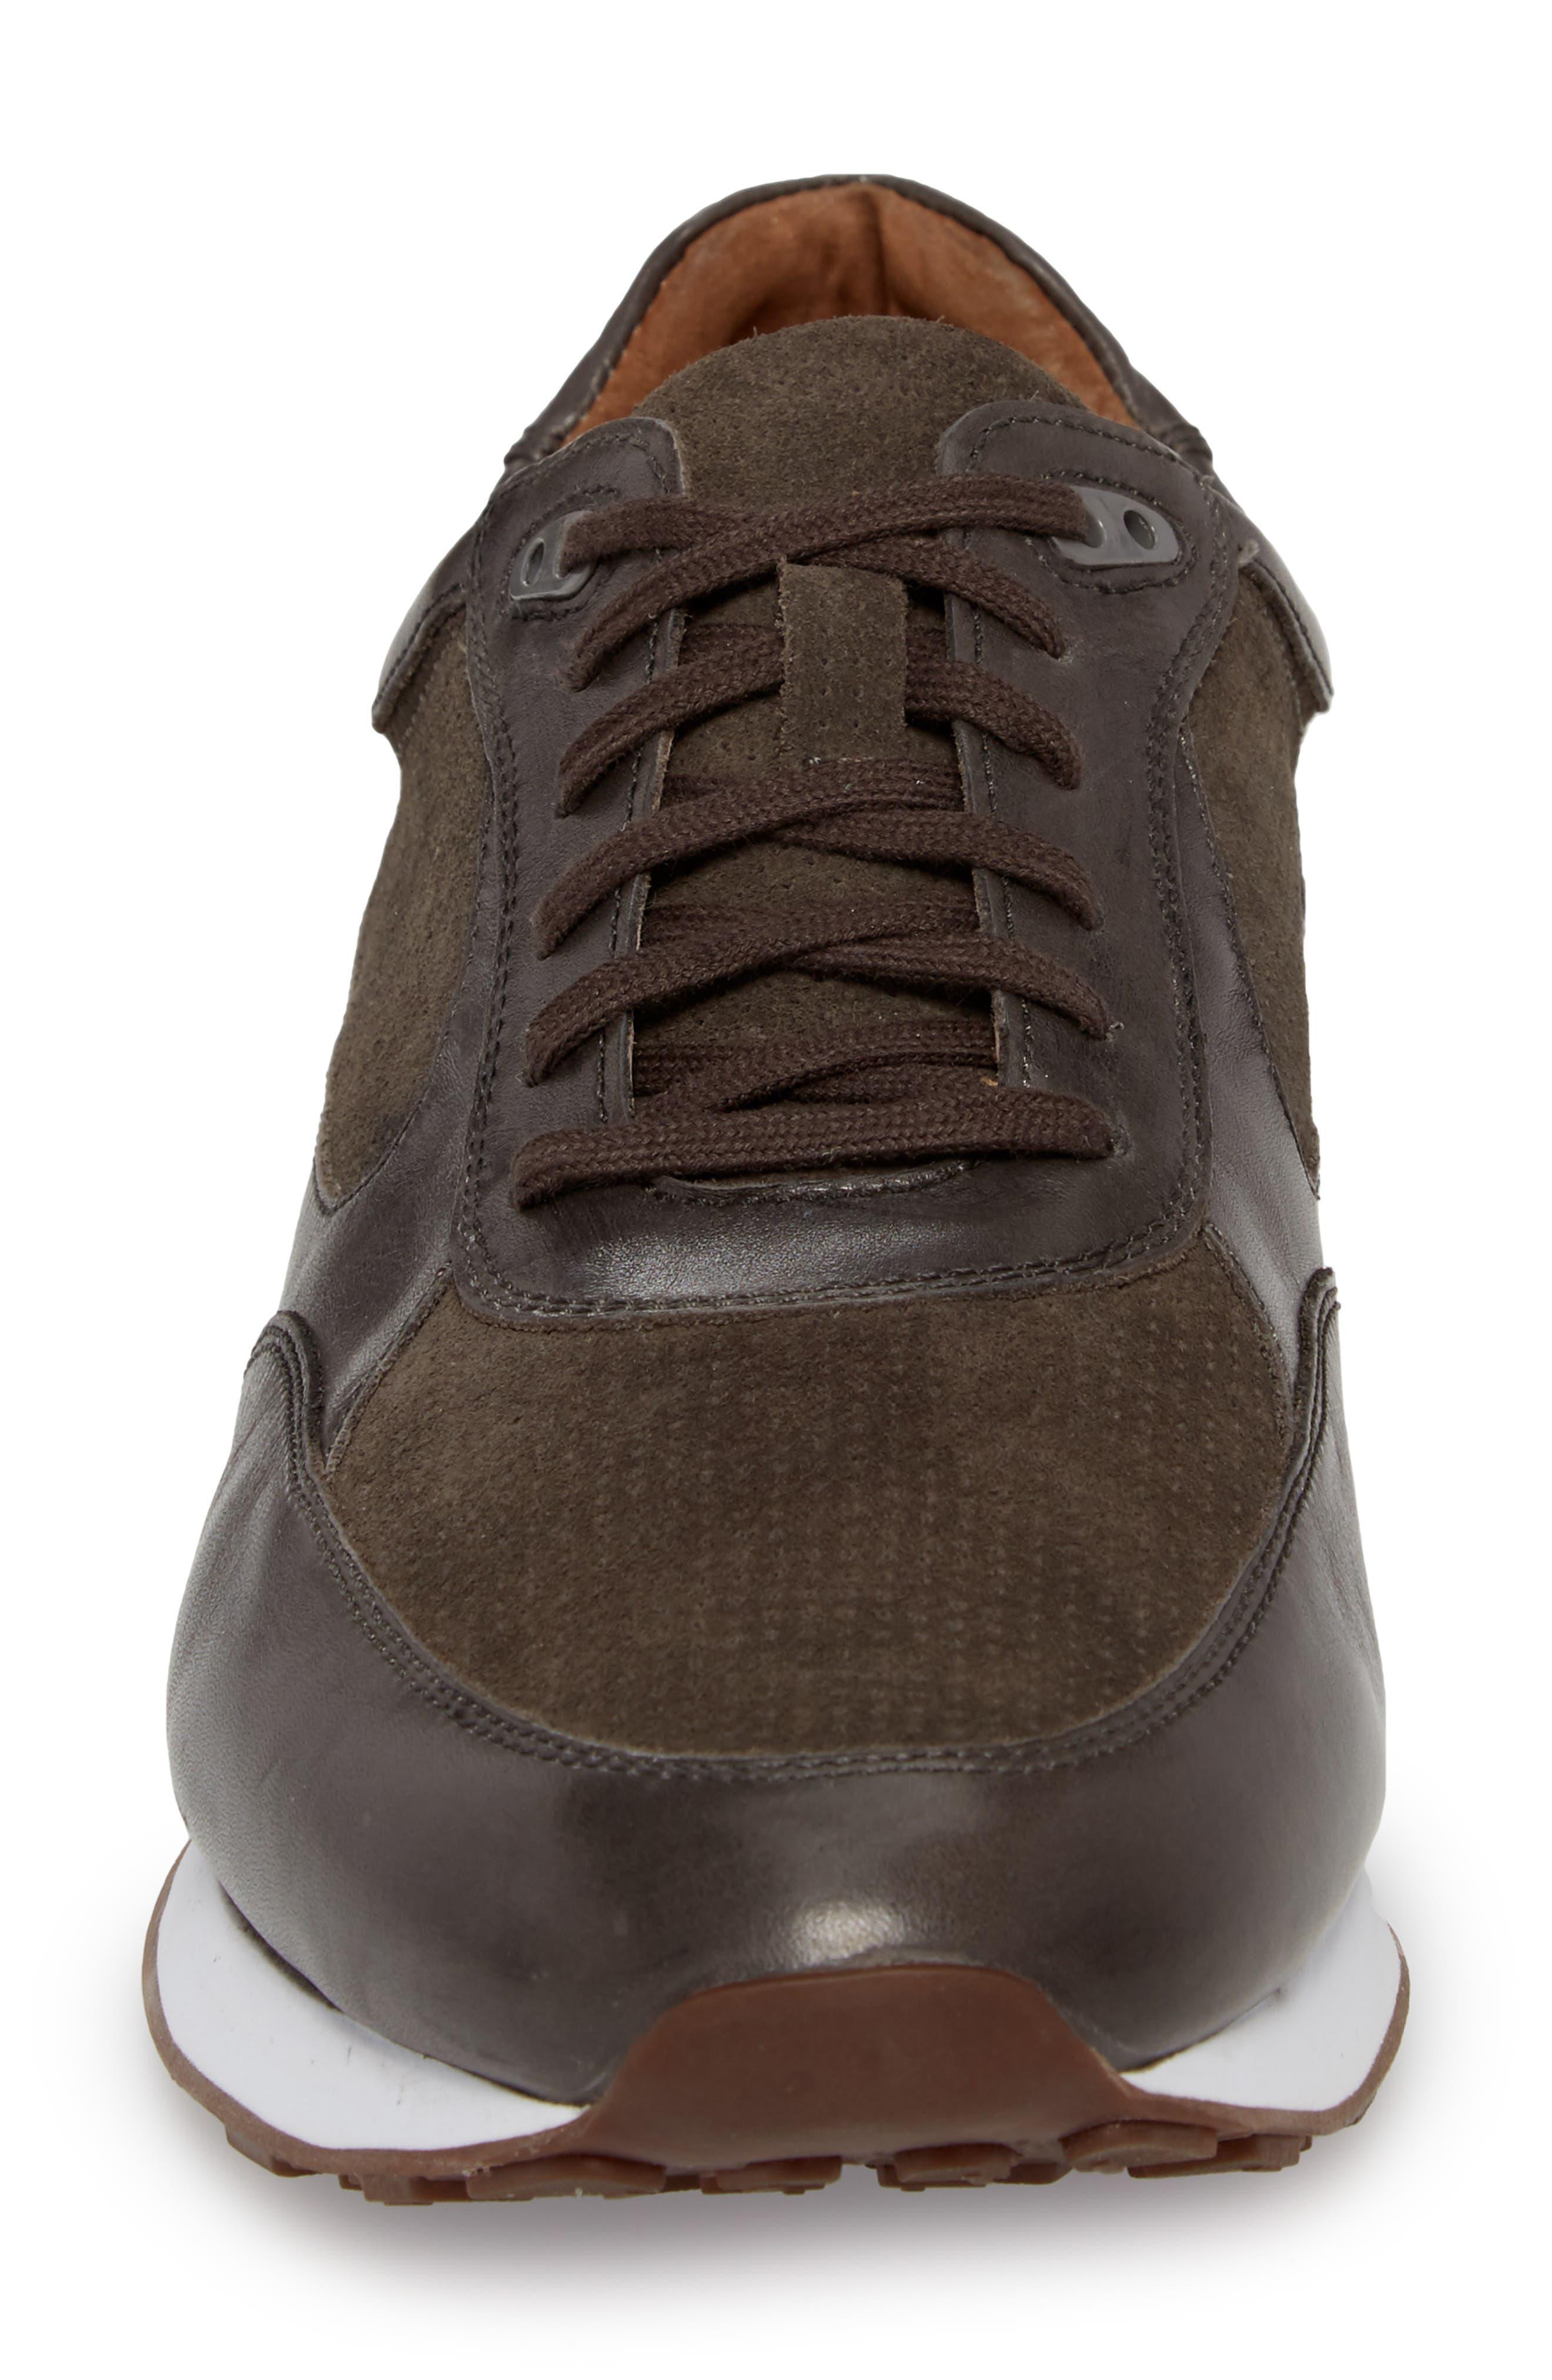 Malek Low Top Sneaker,                             Alternate thumbnail 4, color,                             020